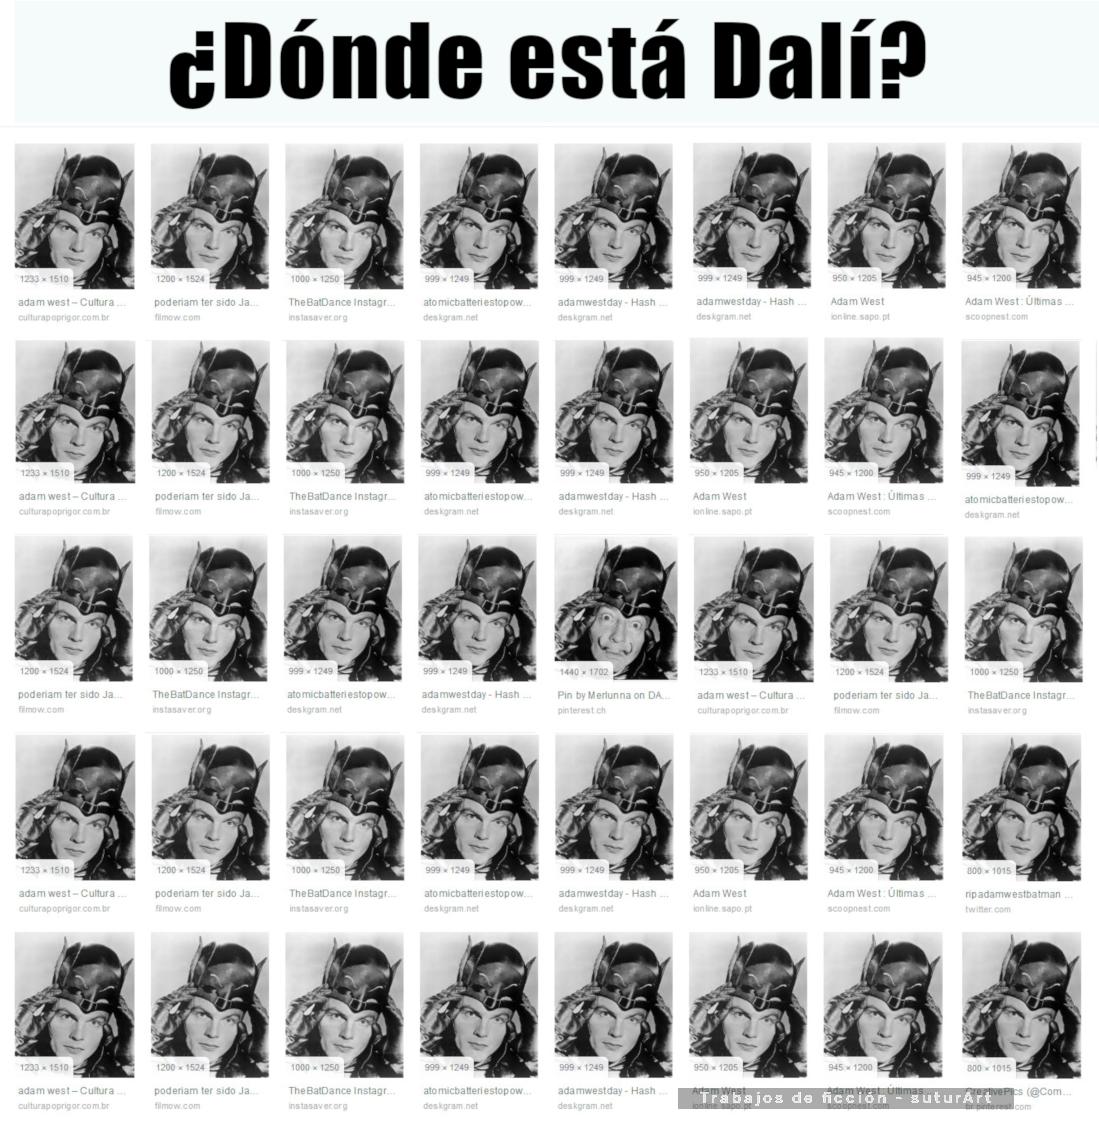 Meme – POP art – Adam West: buscando a Dalí